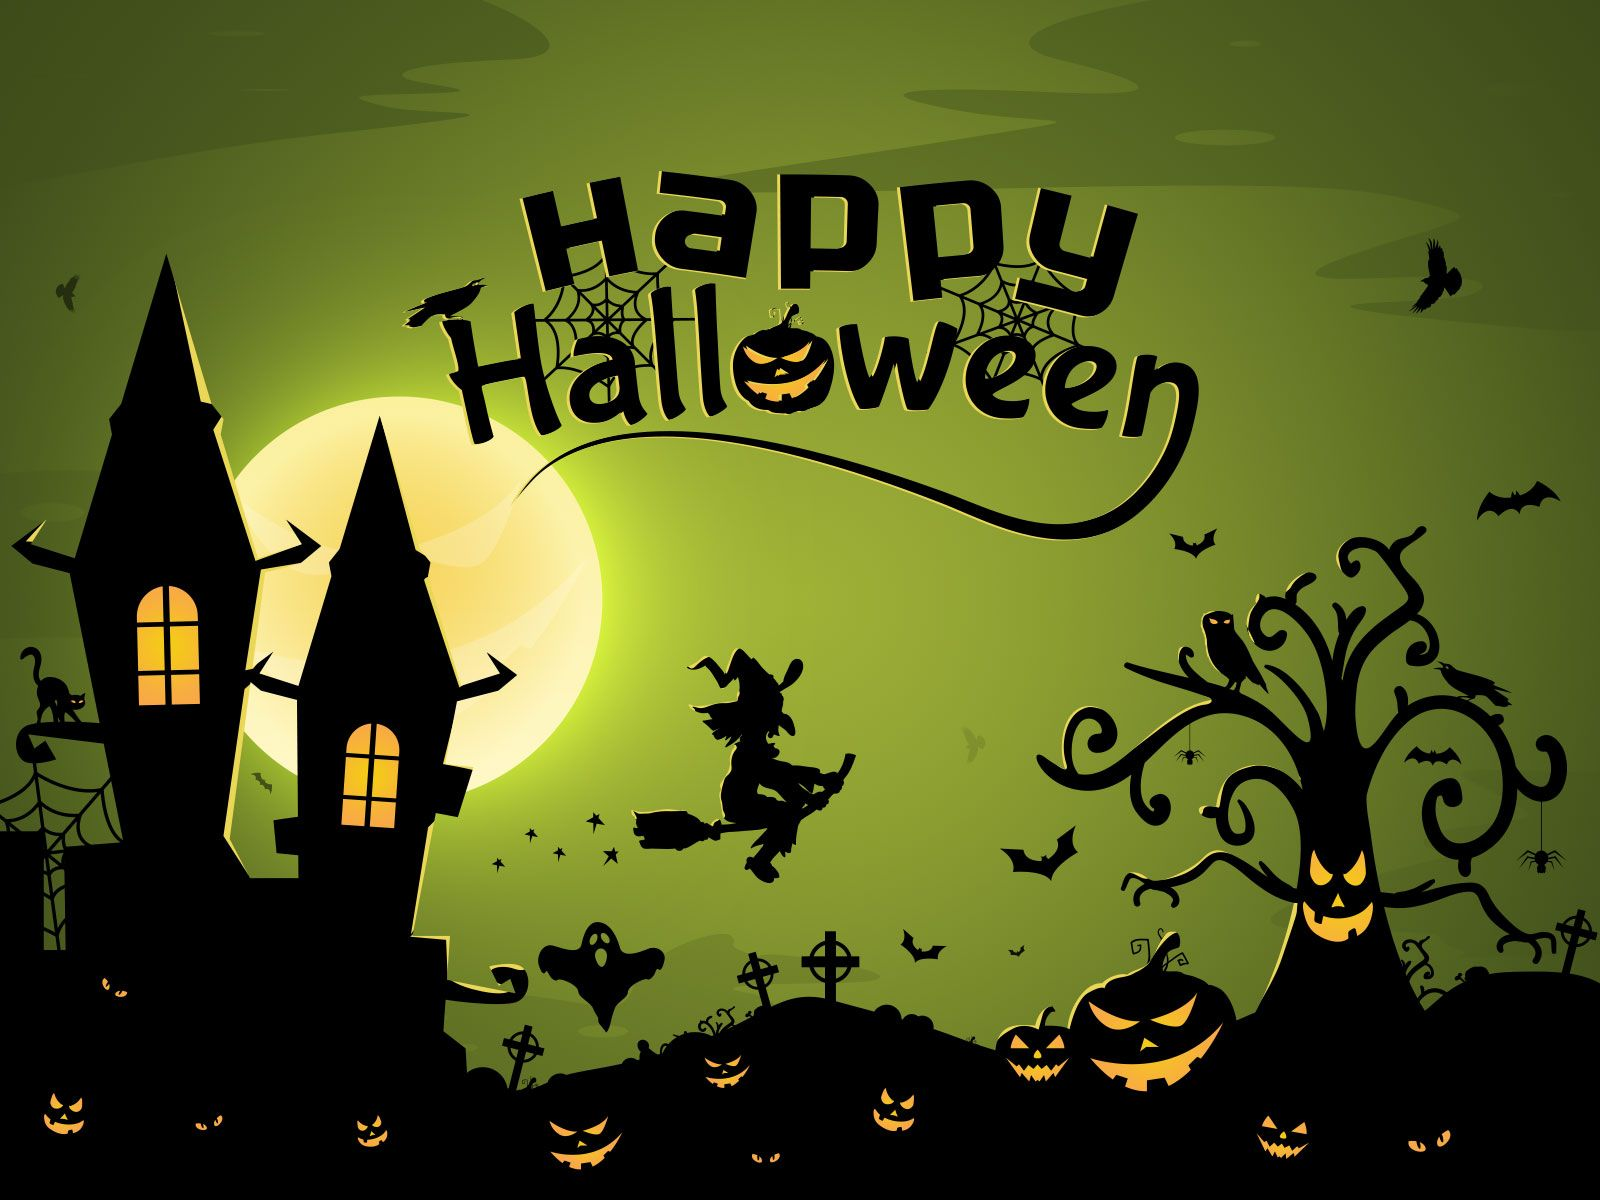 Happy Halloween Images Free